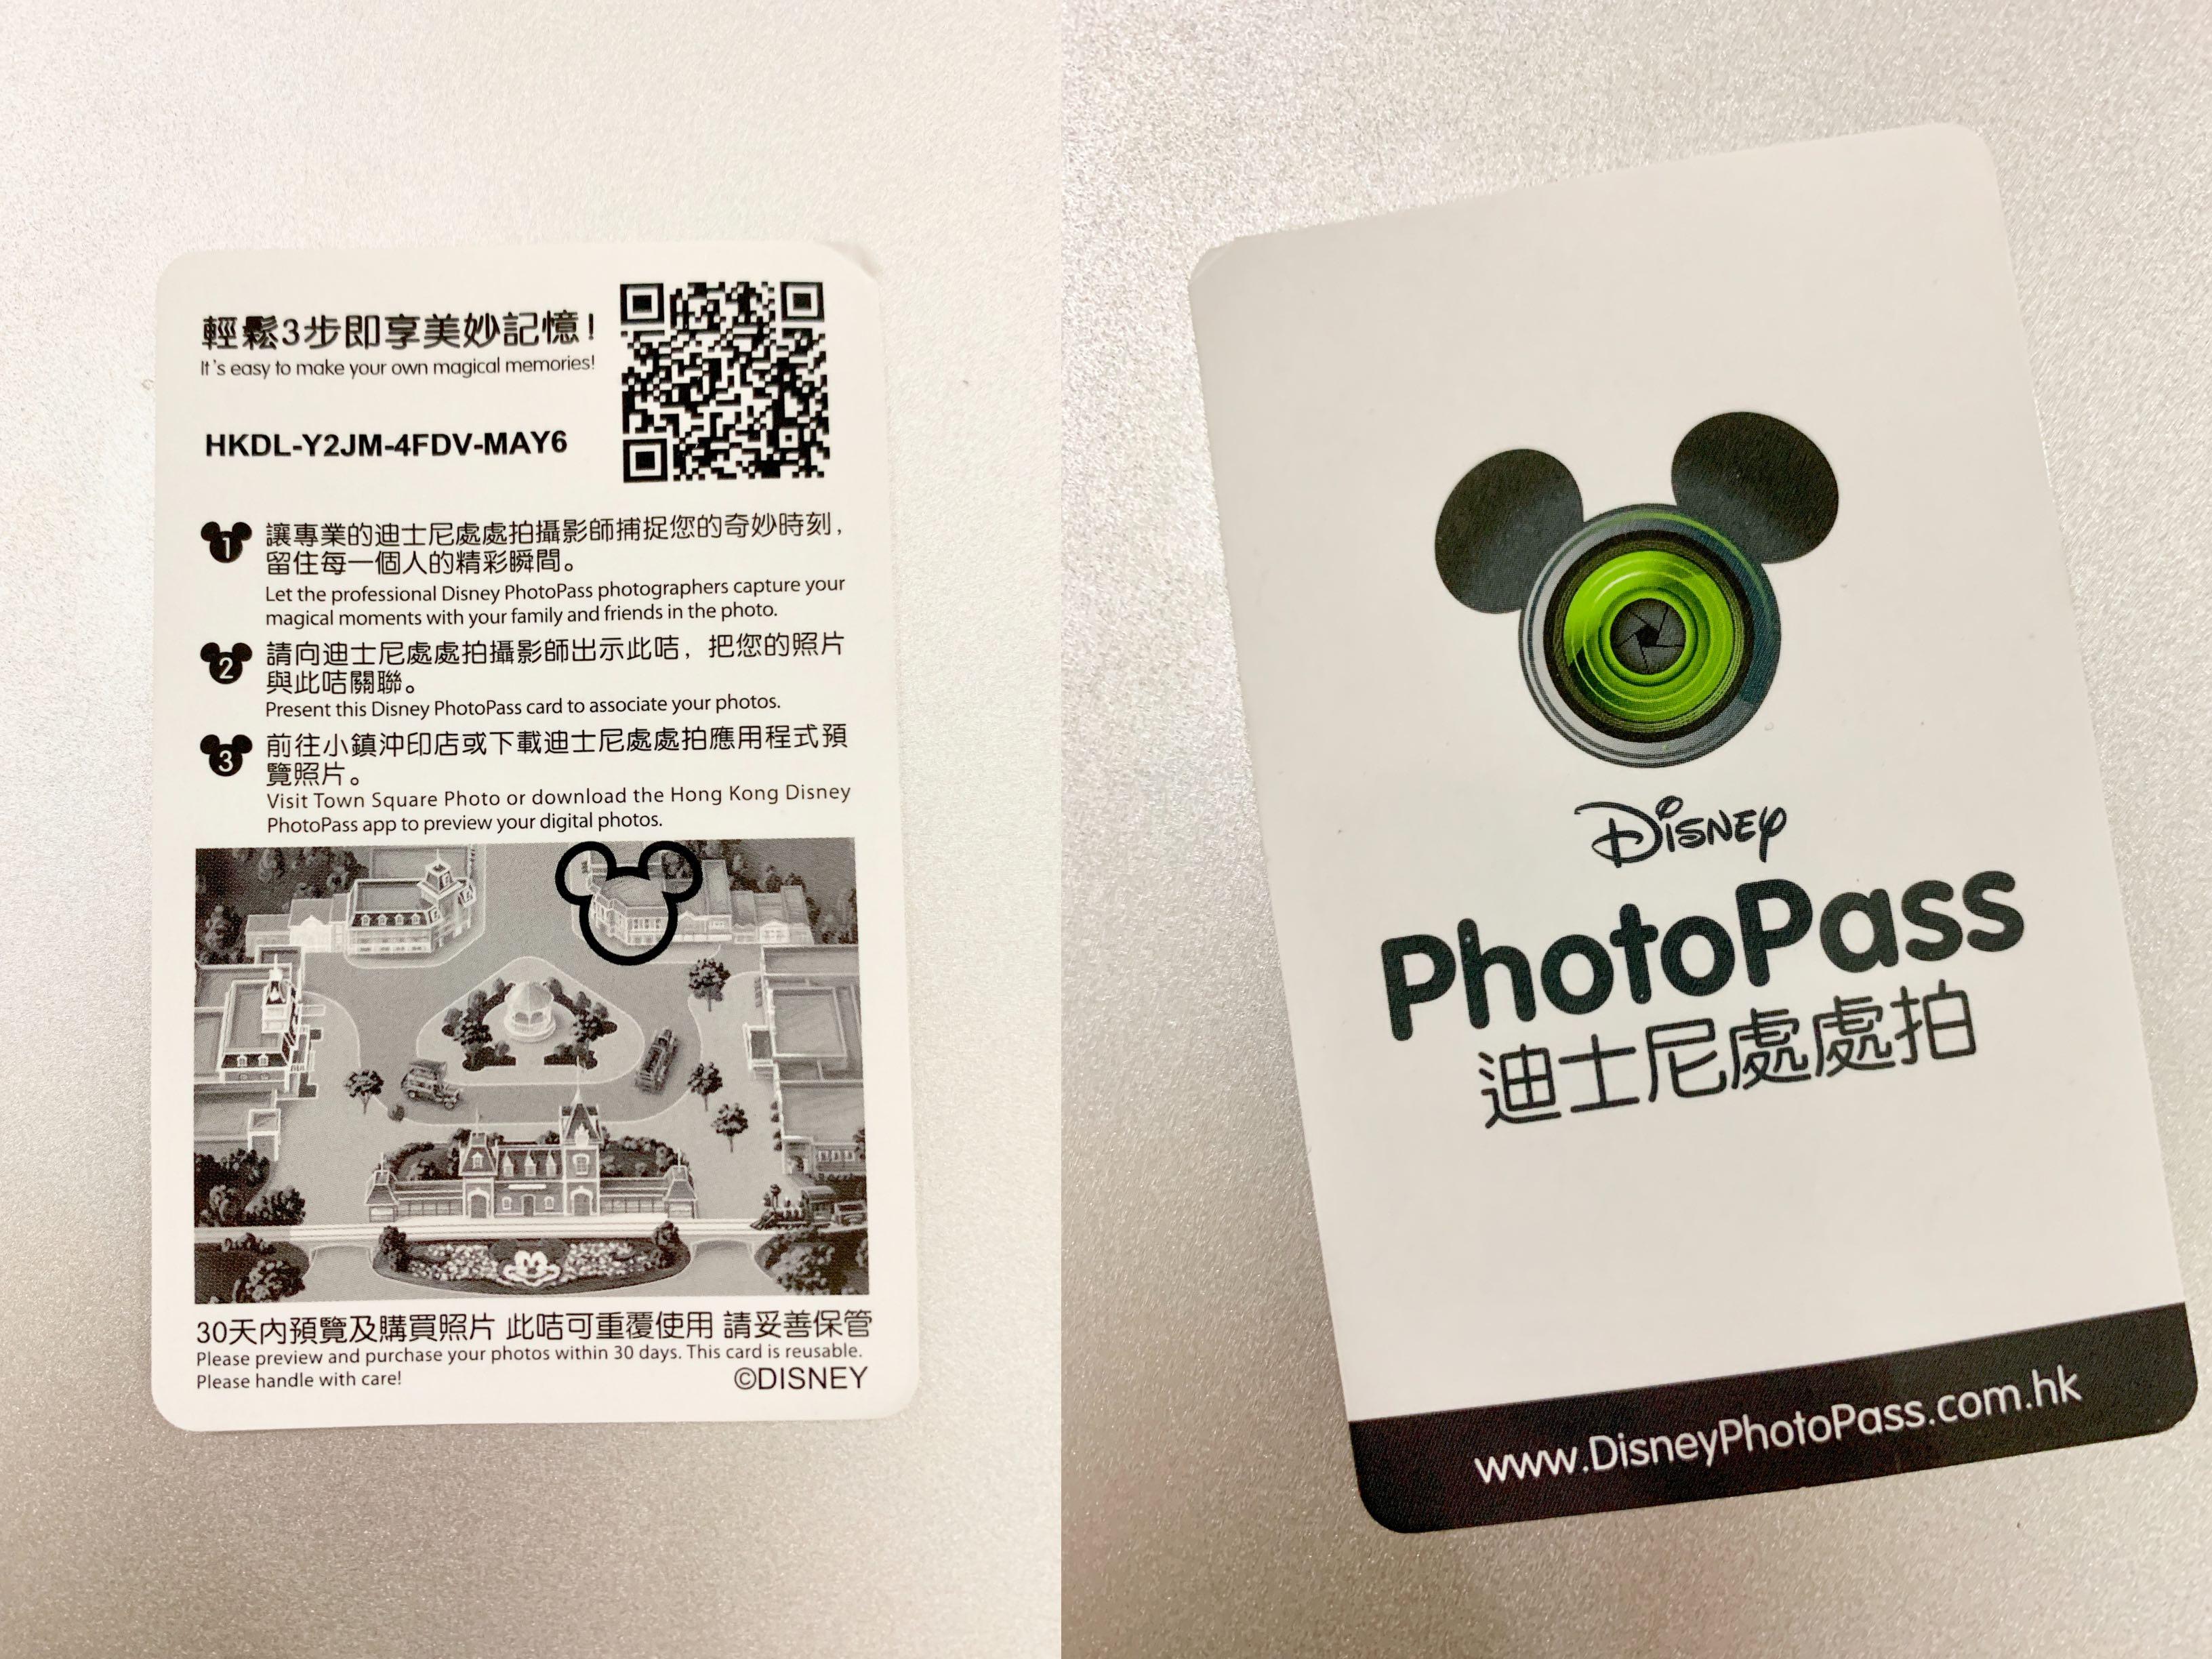 photo pass disneyland hong kong